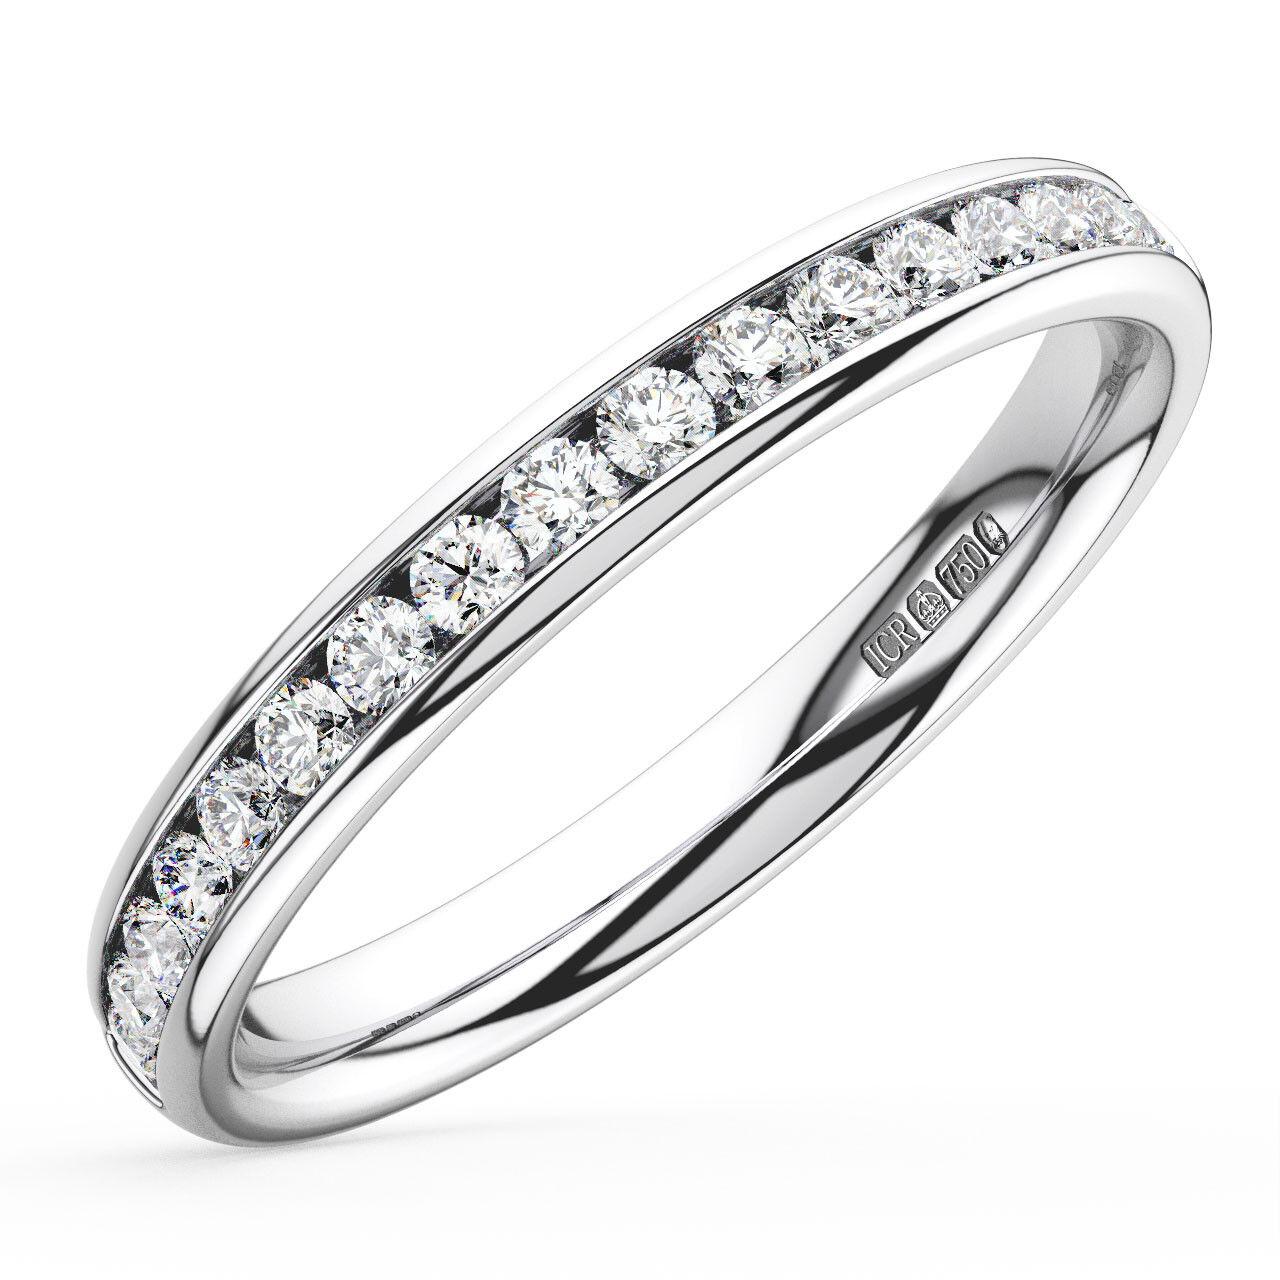 0.20CT Round Brilliant Cut Diamonds Half Eternity Wedding Ring in 9K White gold